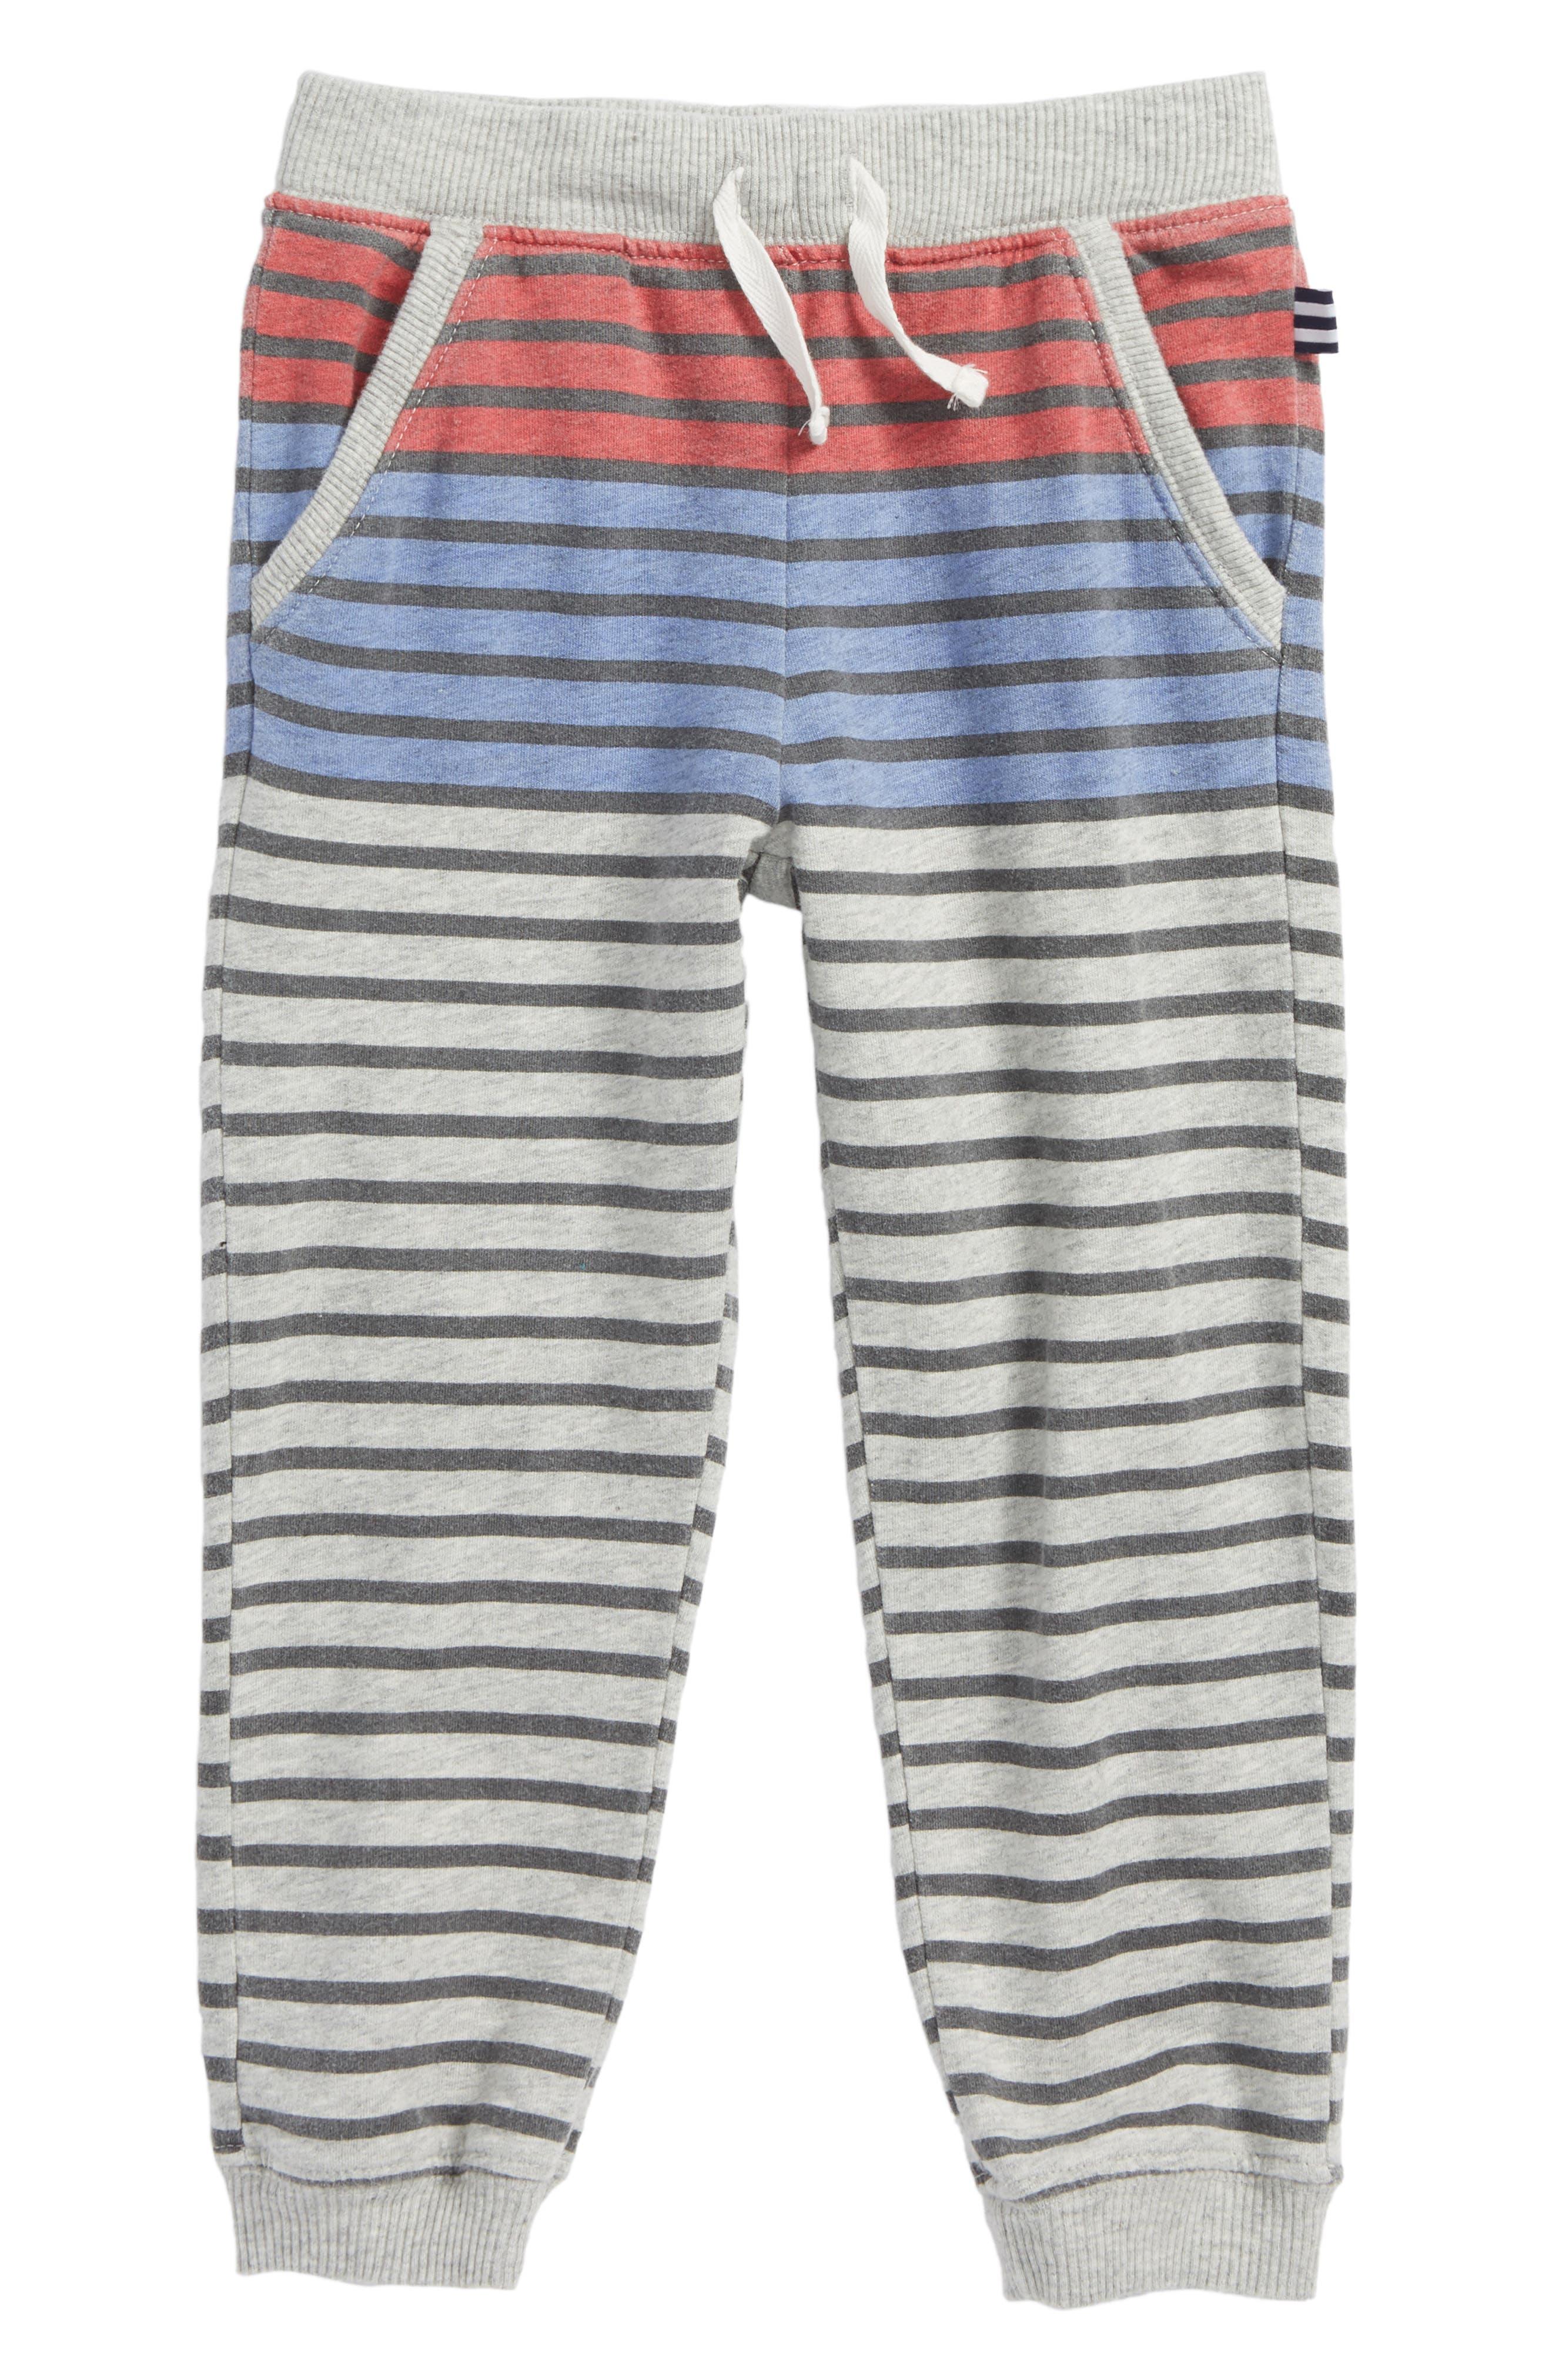 Splendid Stripe French Terry Sweatpants (Toddler Boys & Little Boys)